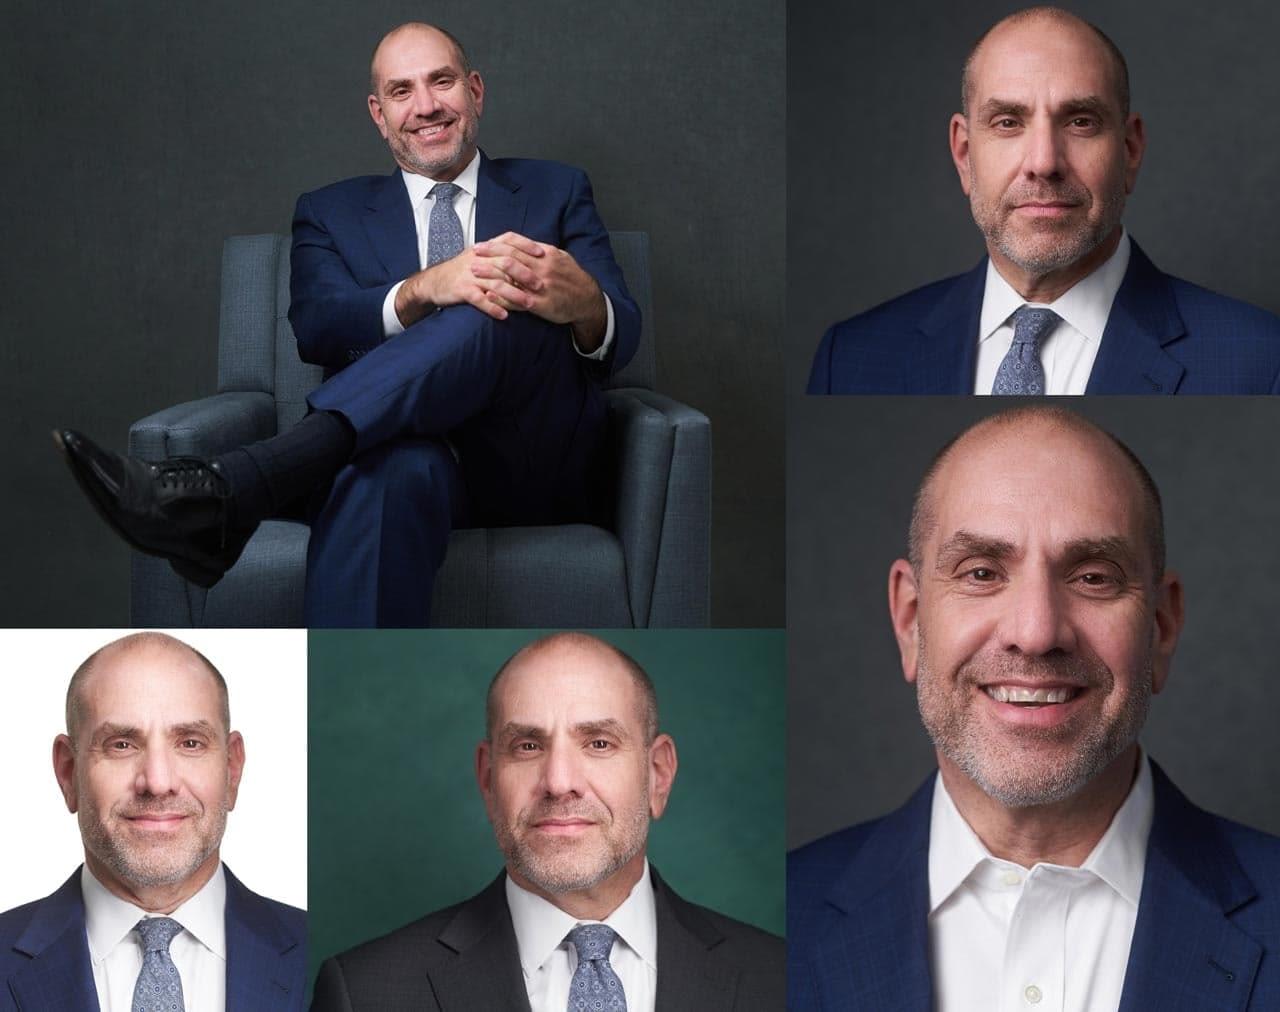 CEO Headshots Collage